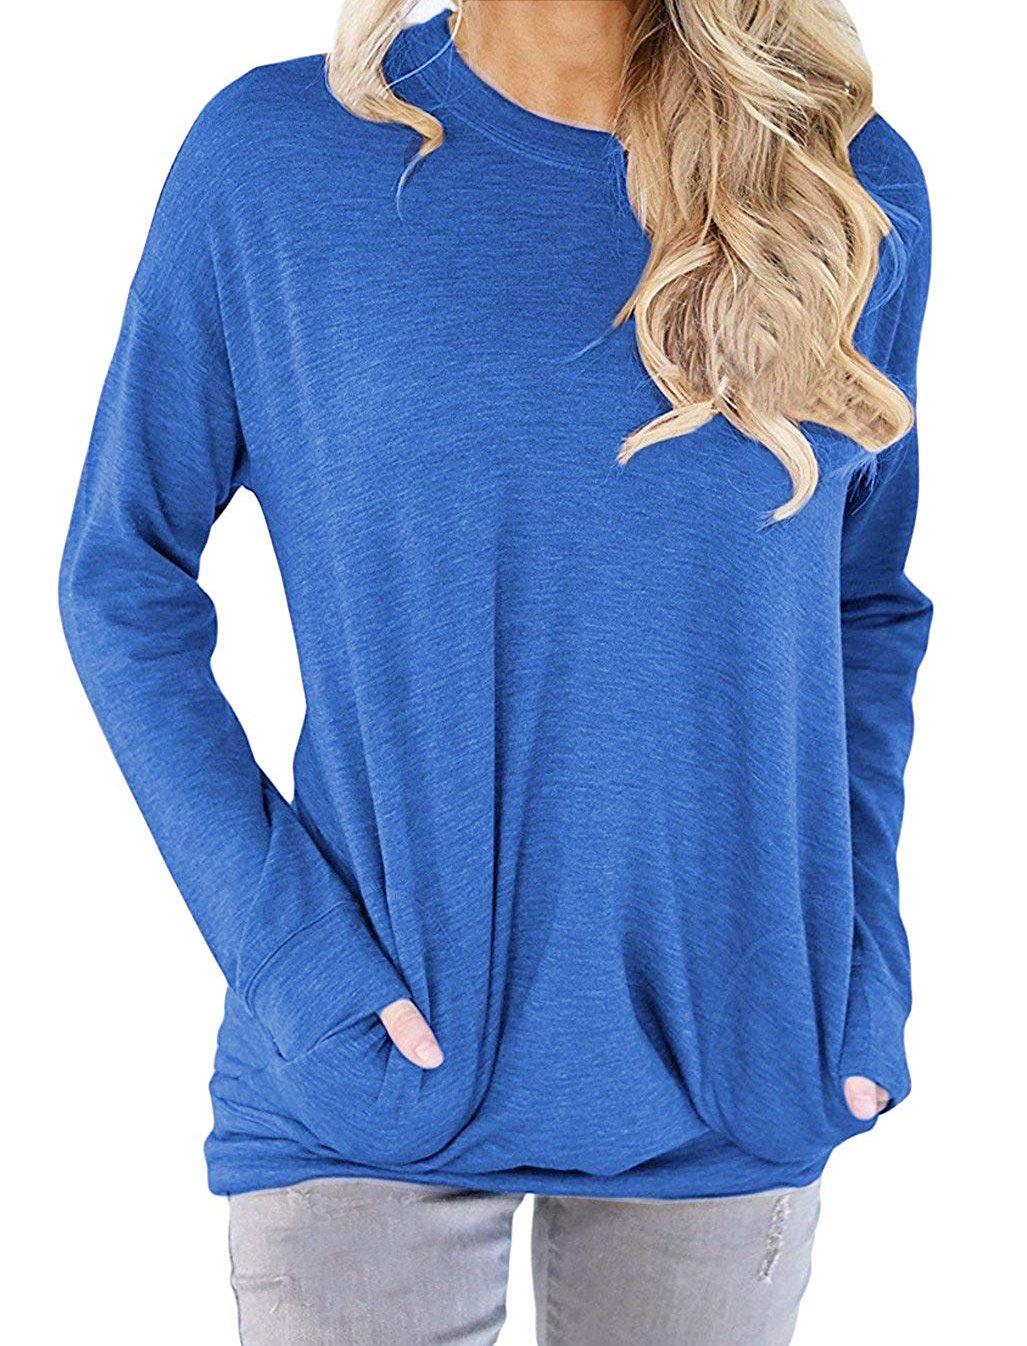 GSVIBK Women Casual Round Neck Sweatshirts Long Sleeve Pullover Shirts Tops Soft Sweatshirts Blouse Pocket Blue M